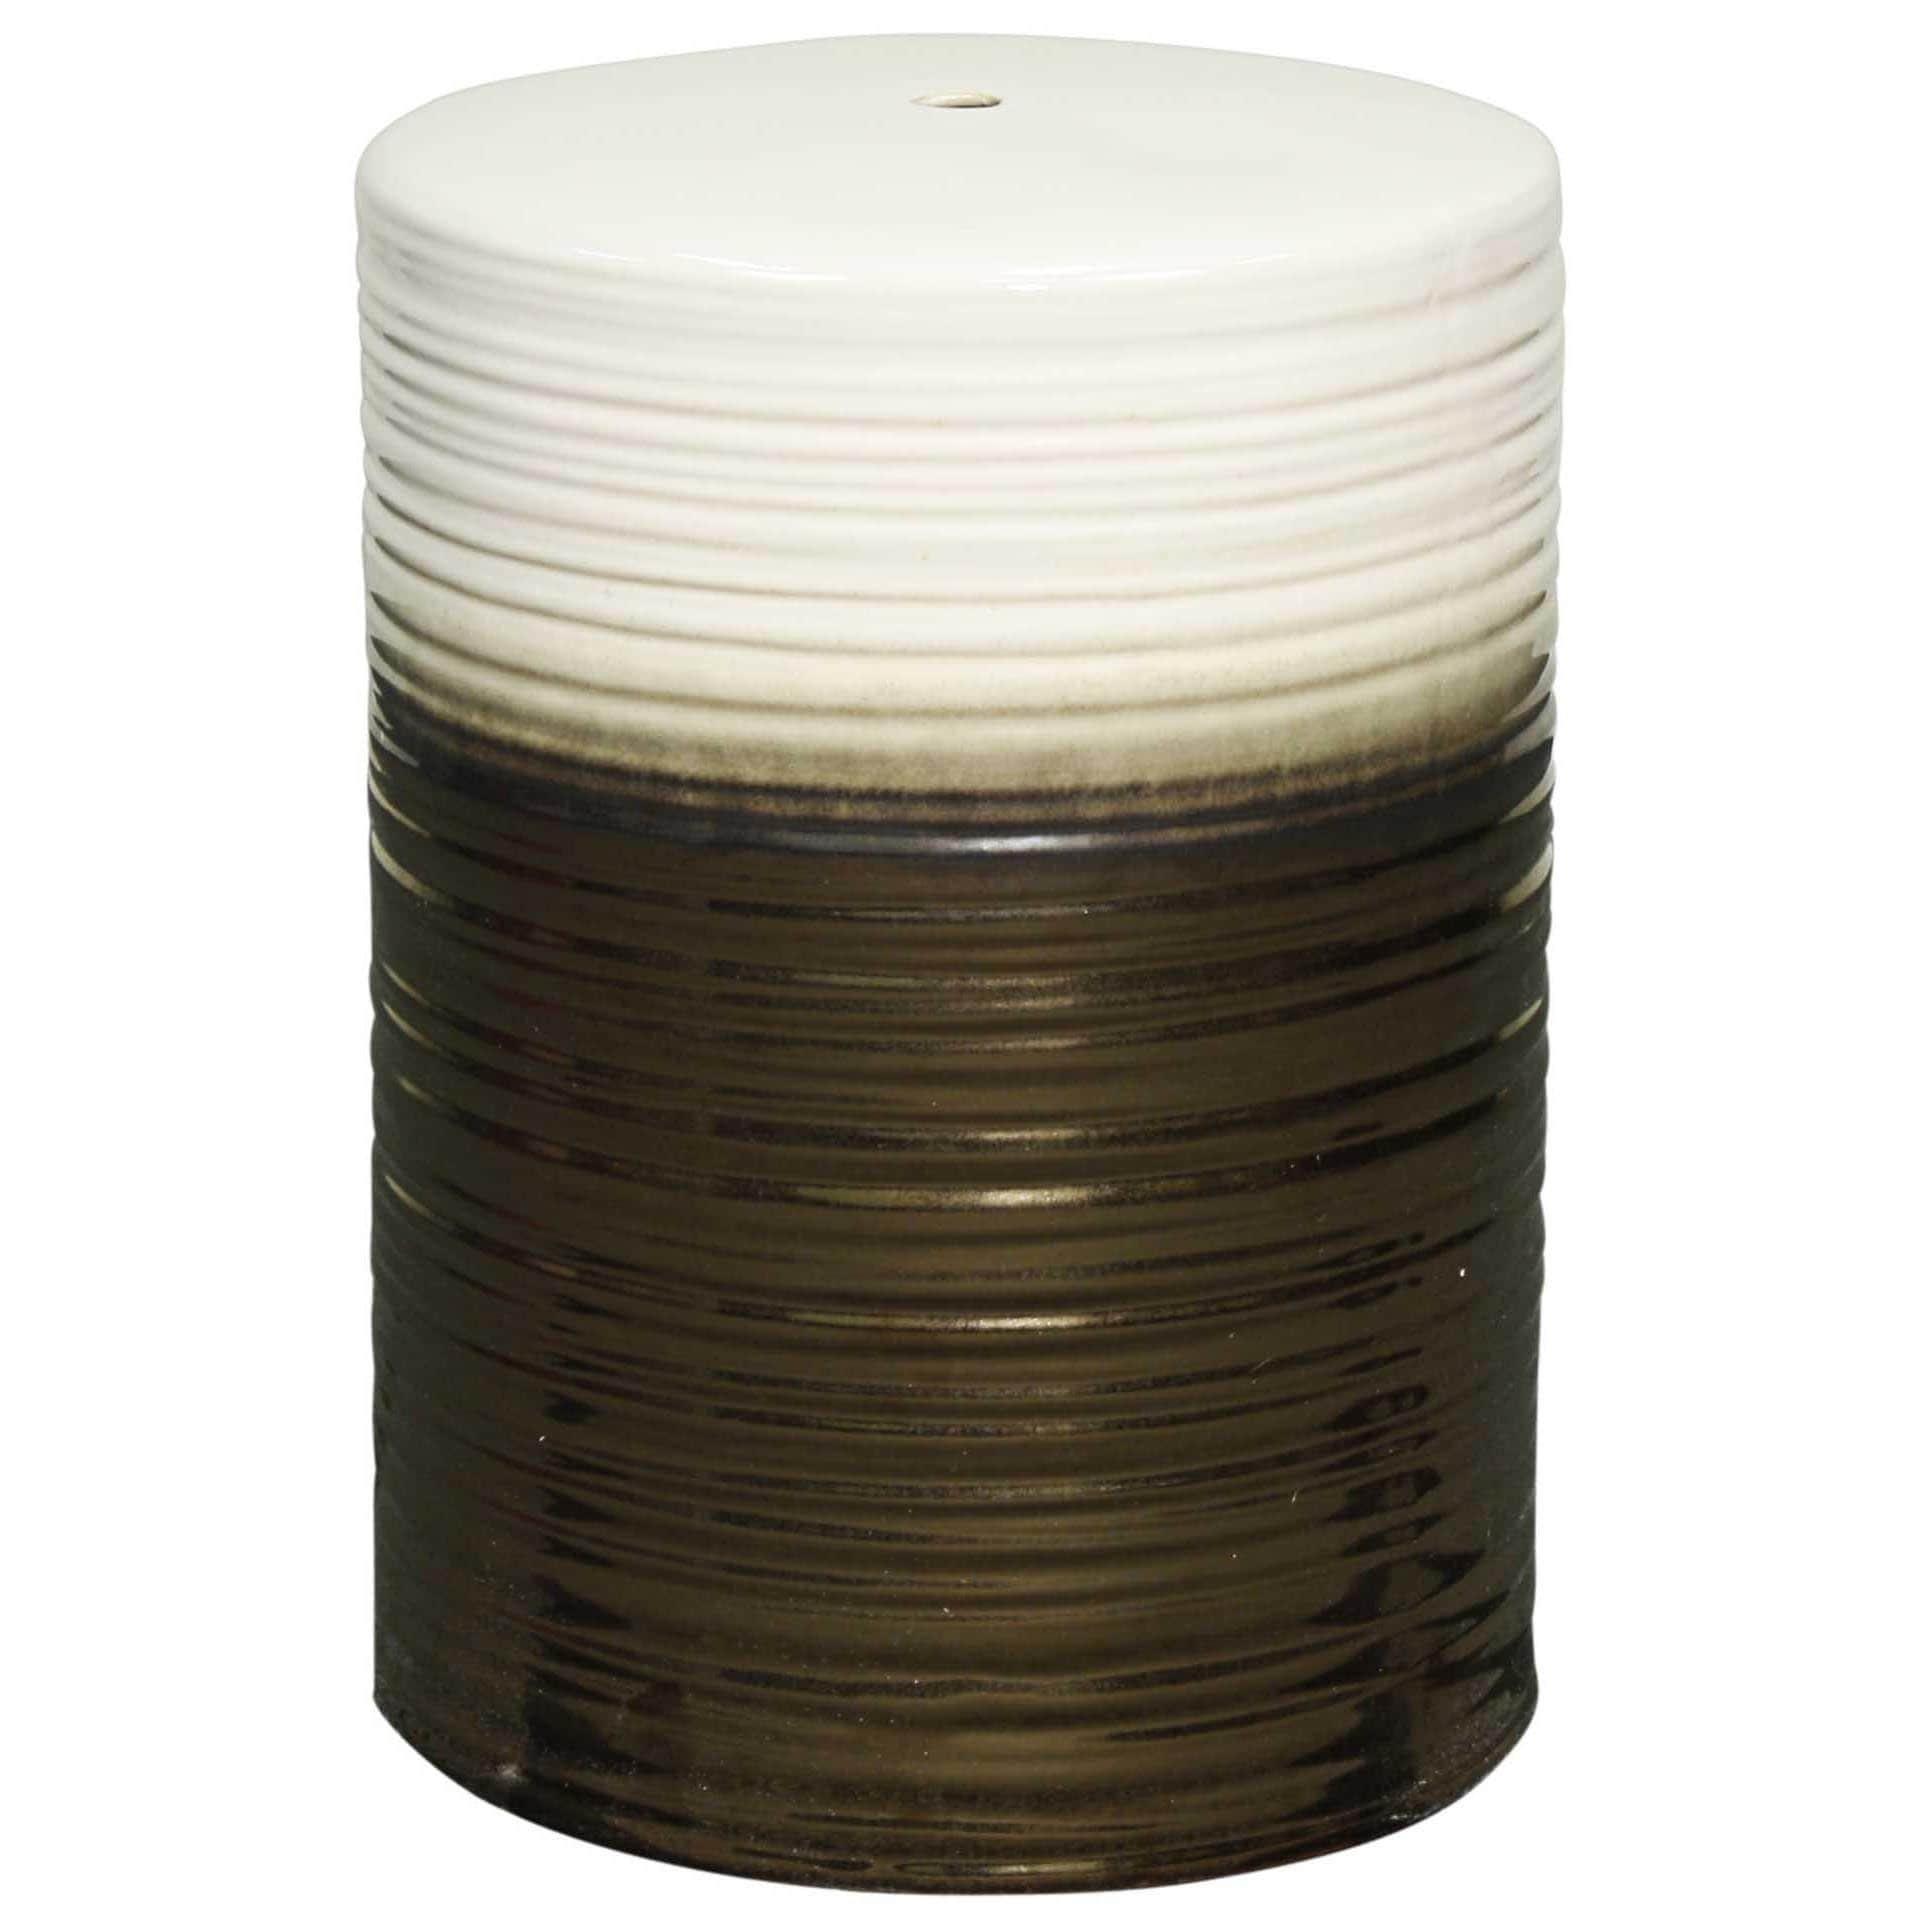 Shop Multicolor Swirl Ceramic Garden Stool - Free Shipping Today ...